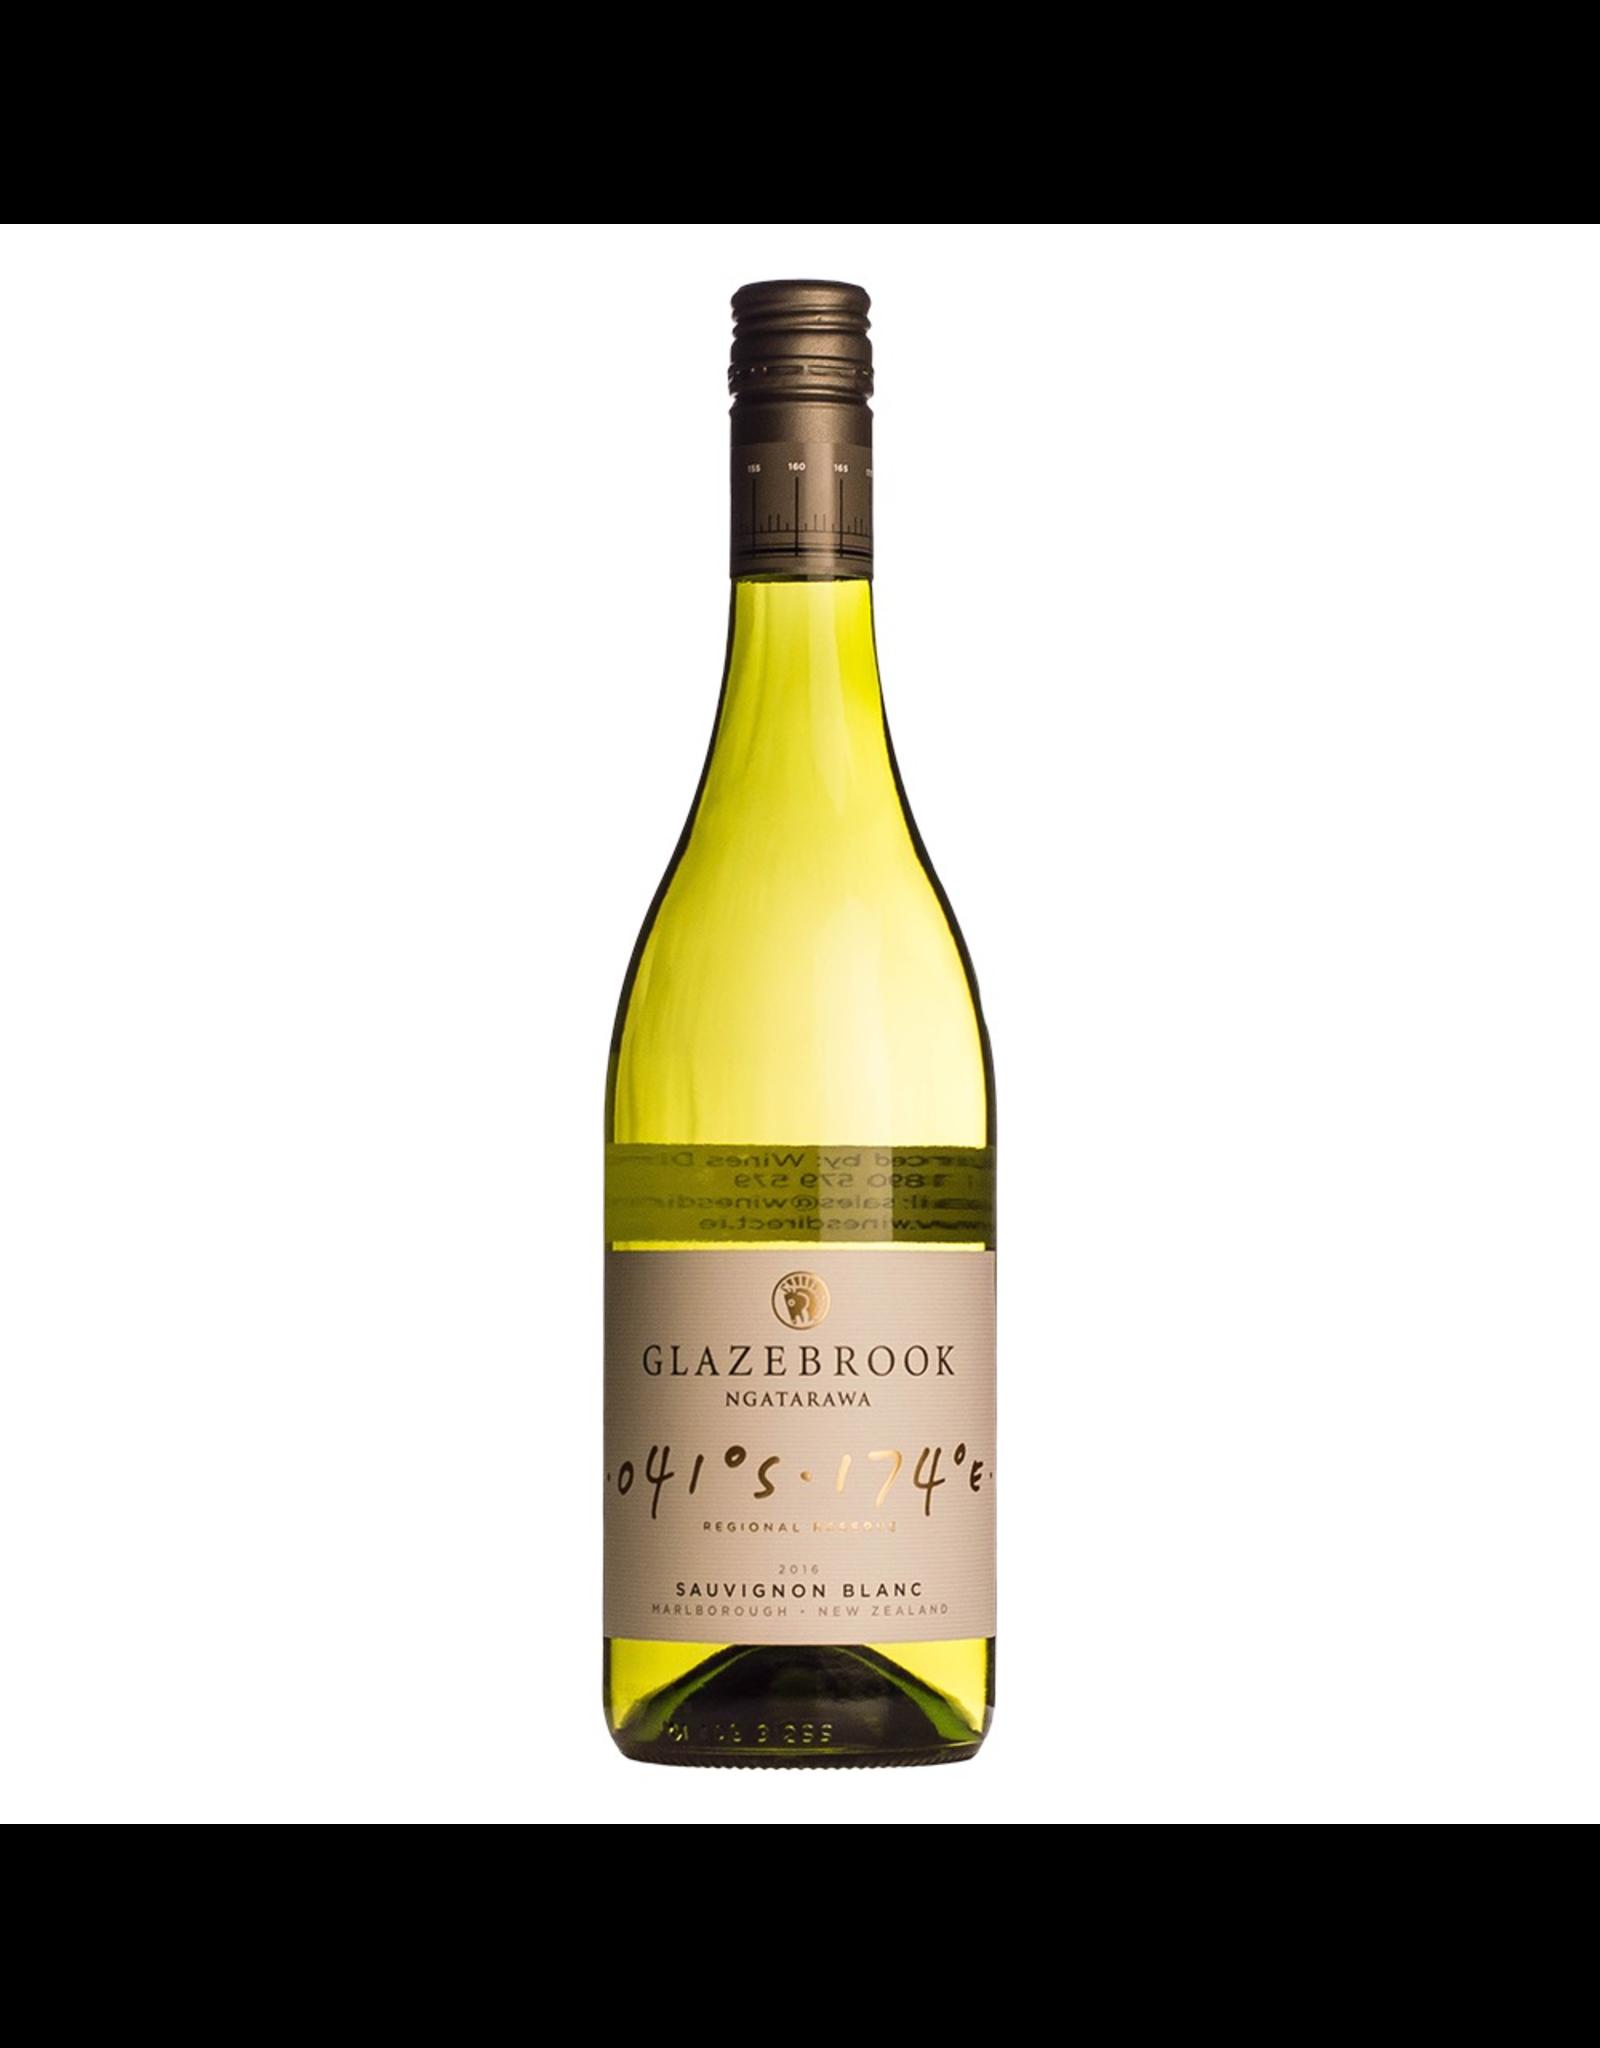 White Wine 2019, Glazebrook Ngatarawa 041S 174E Reserve, Sauvignon Blanc, Marlborough, Marlborough, New Zealand, 13.0% Alc, CTnr, TW92